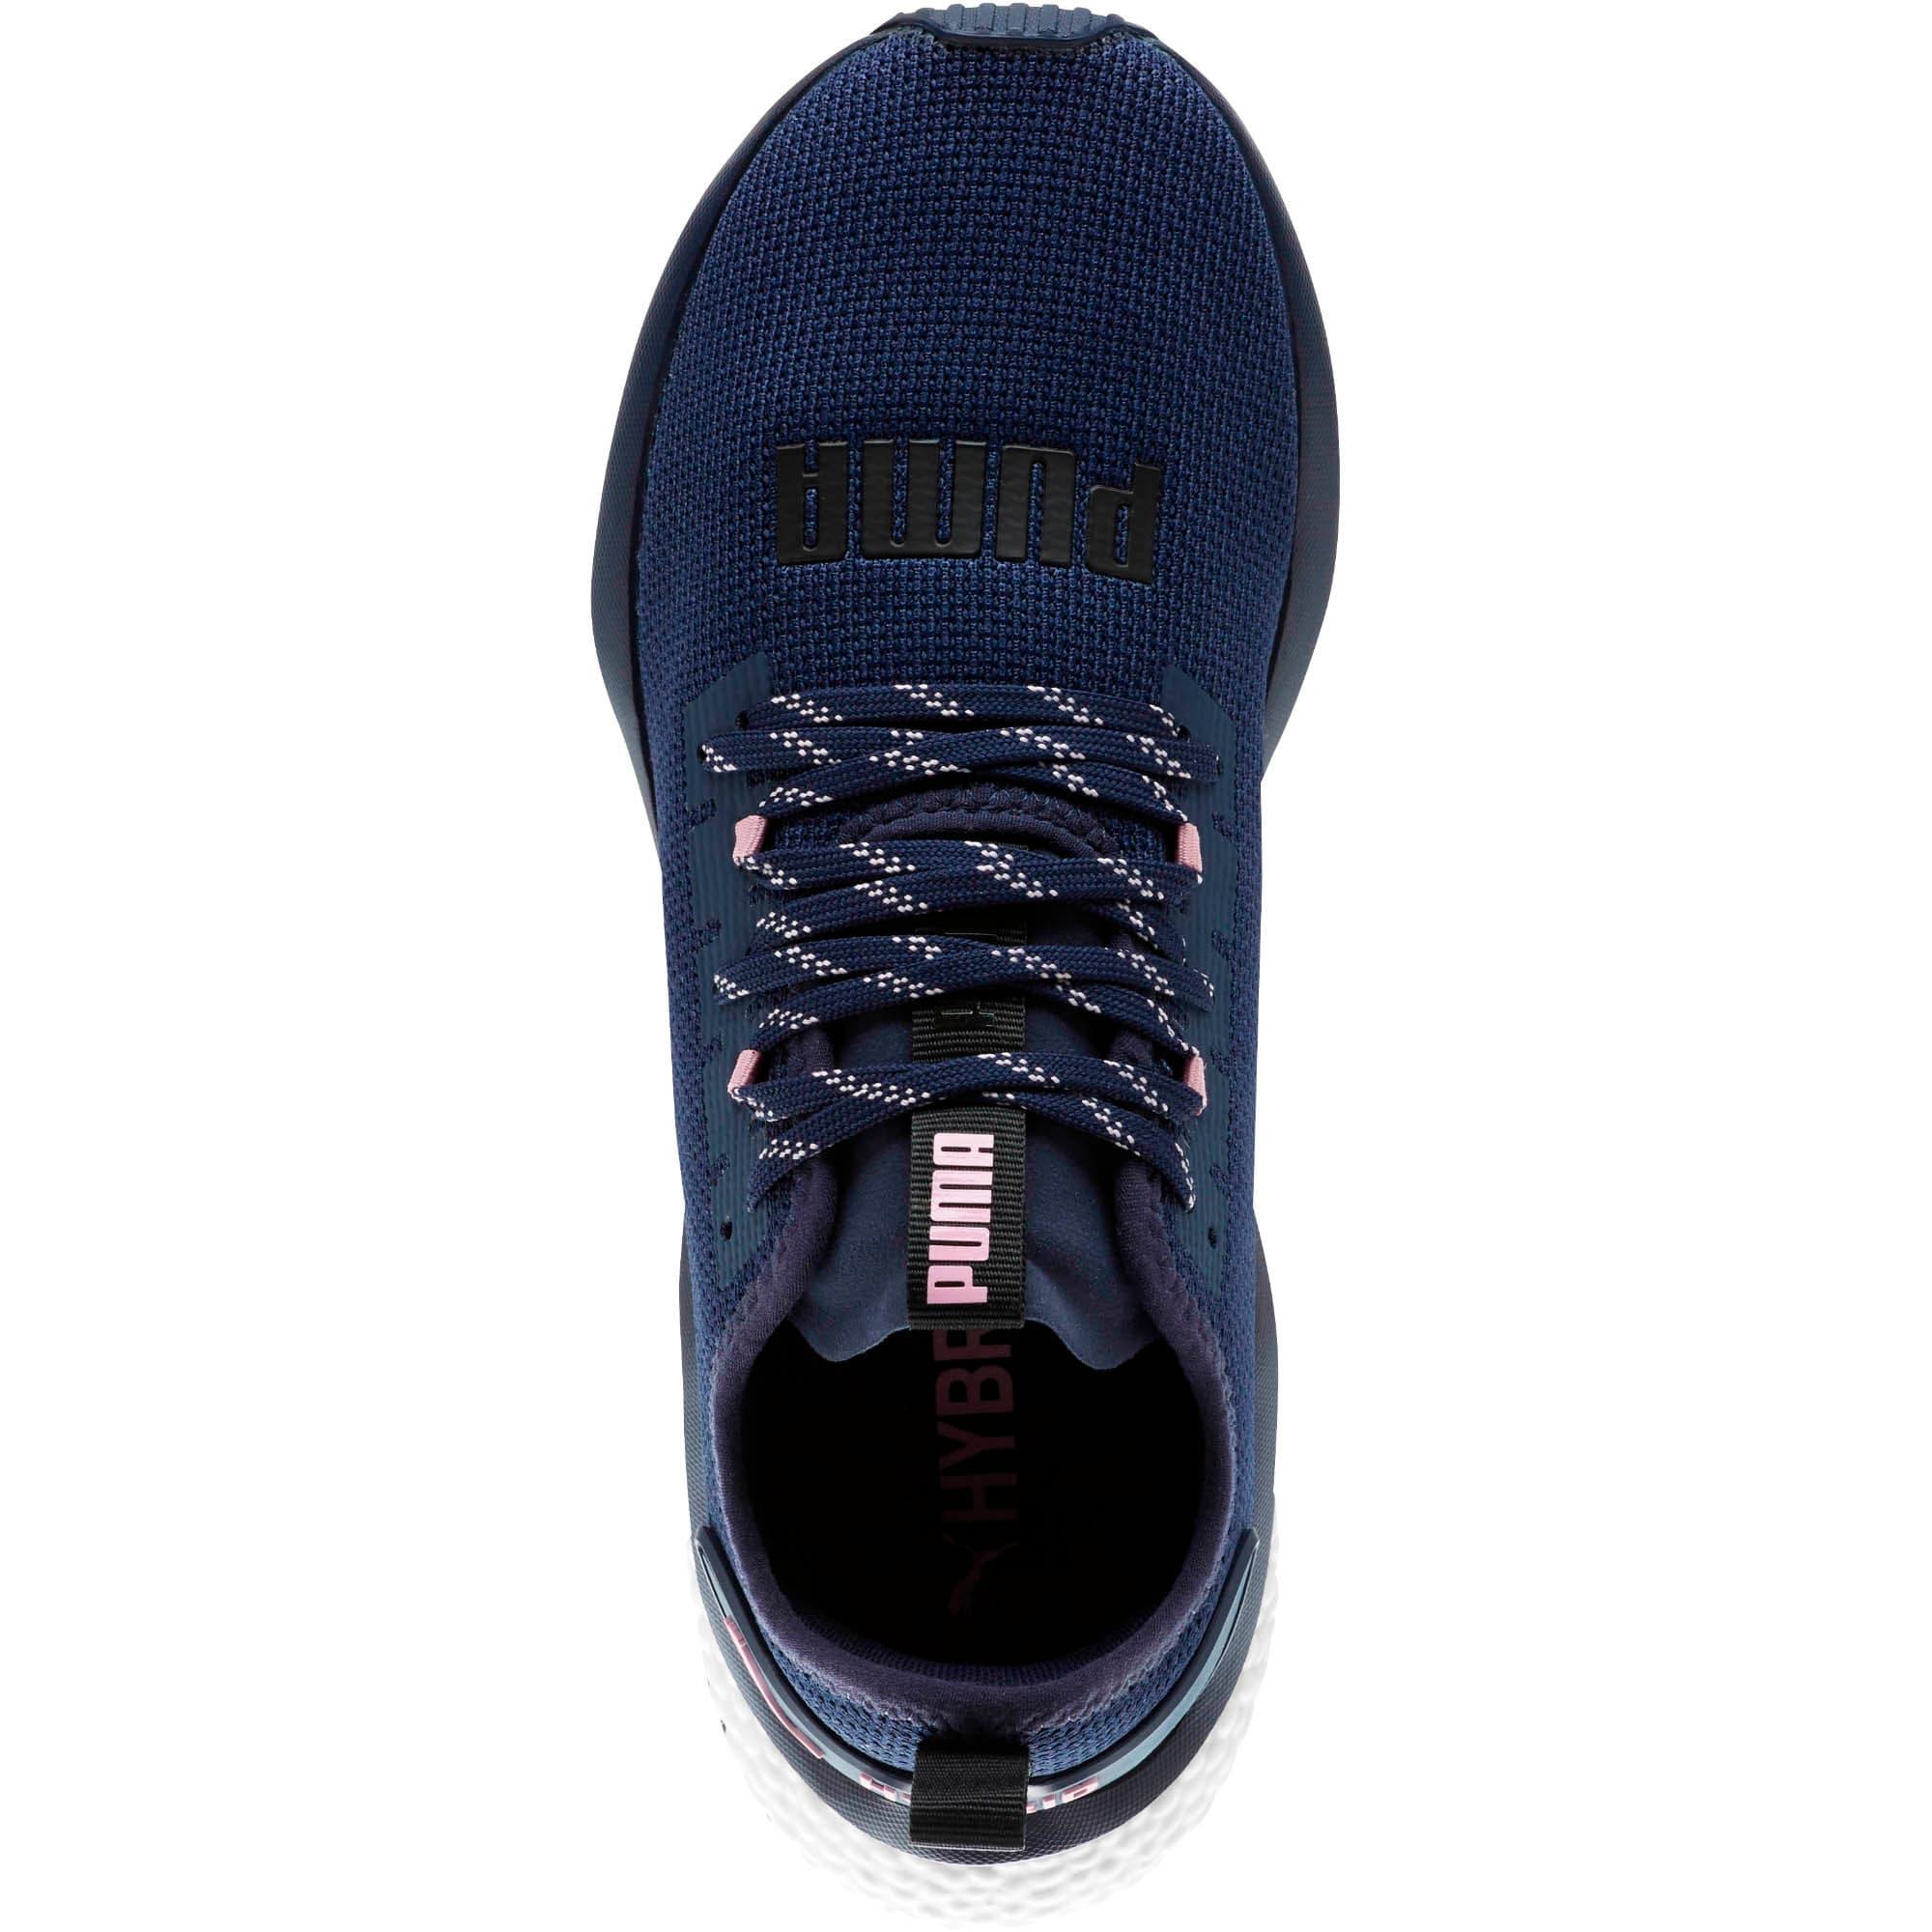 Thumbnail 5 of HYBRID NX Women's Running Shoes, Peacoat-Pale Pink, medium